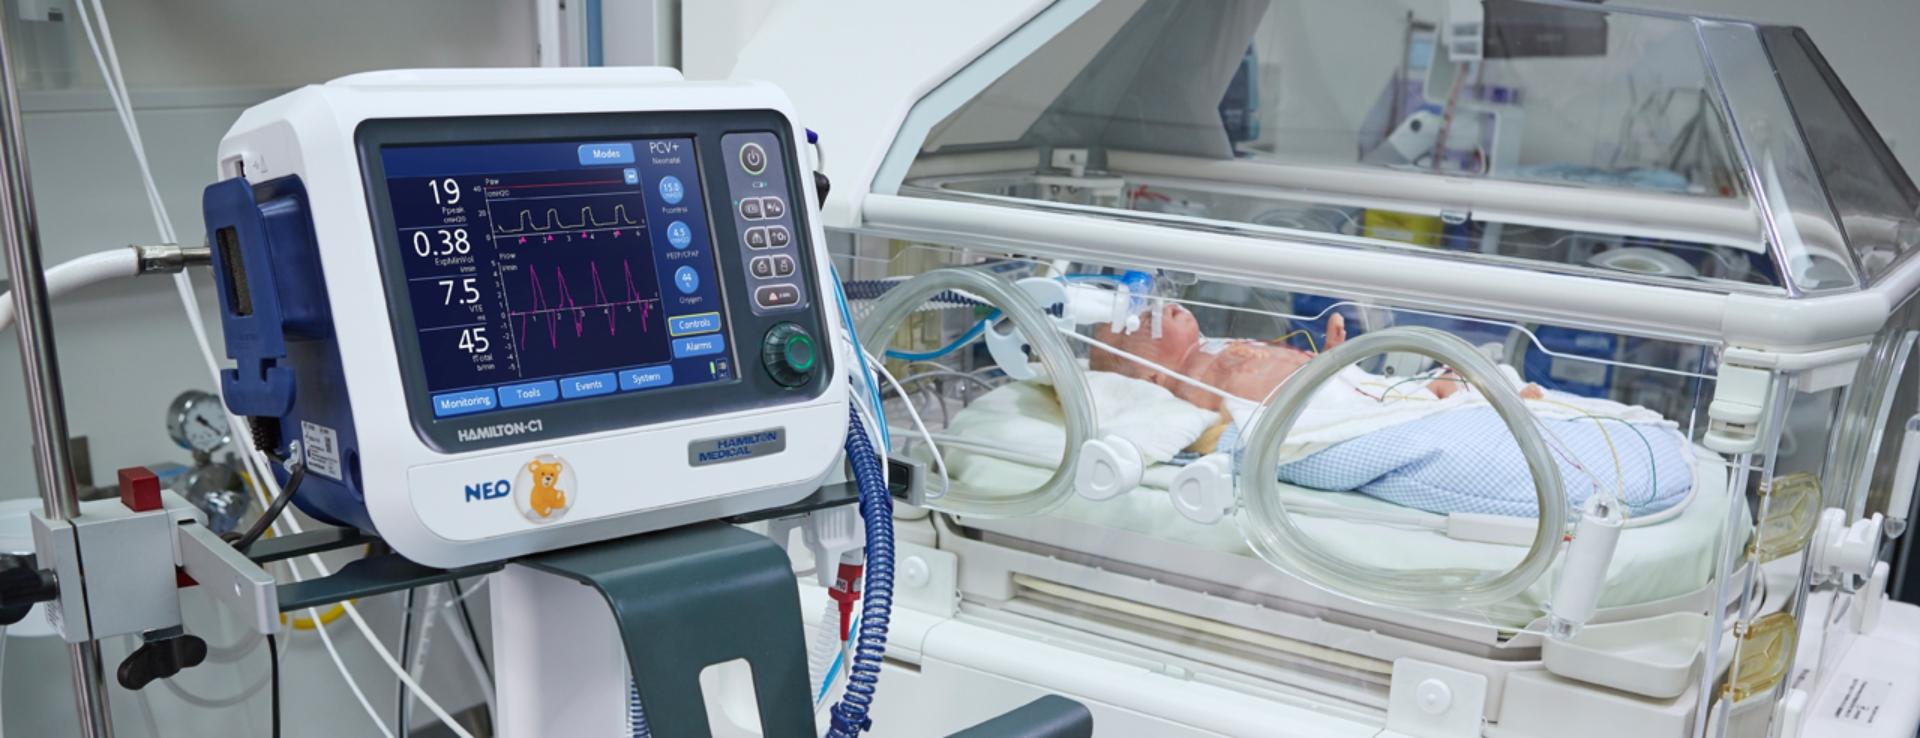 ventilator - photo #12